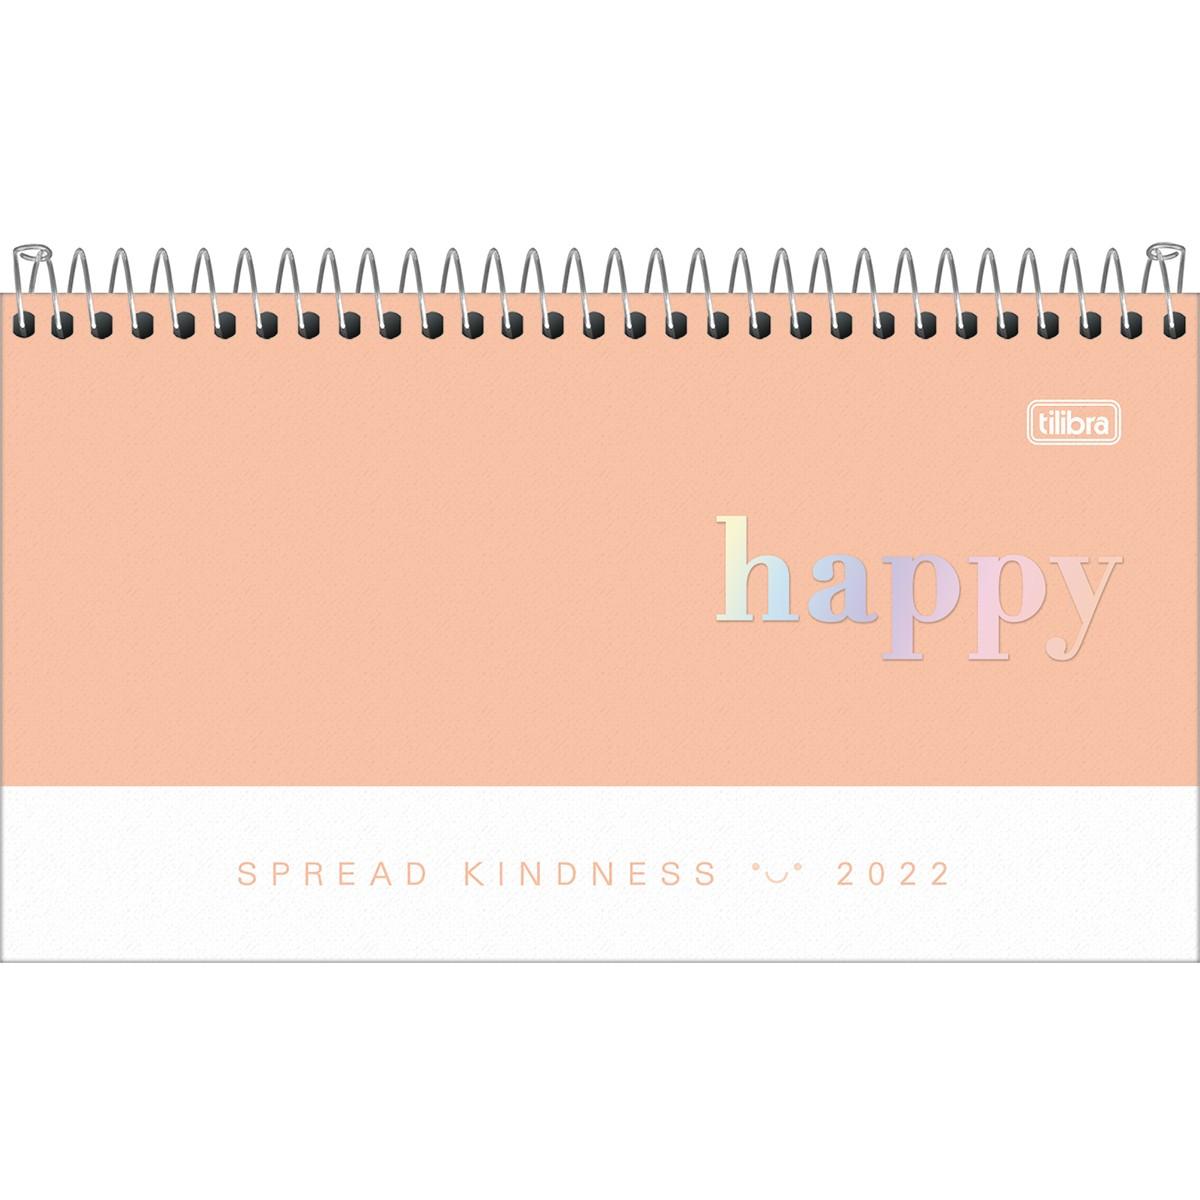 Agenda Espiral Semanal Happy 2022 - Coral